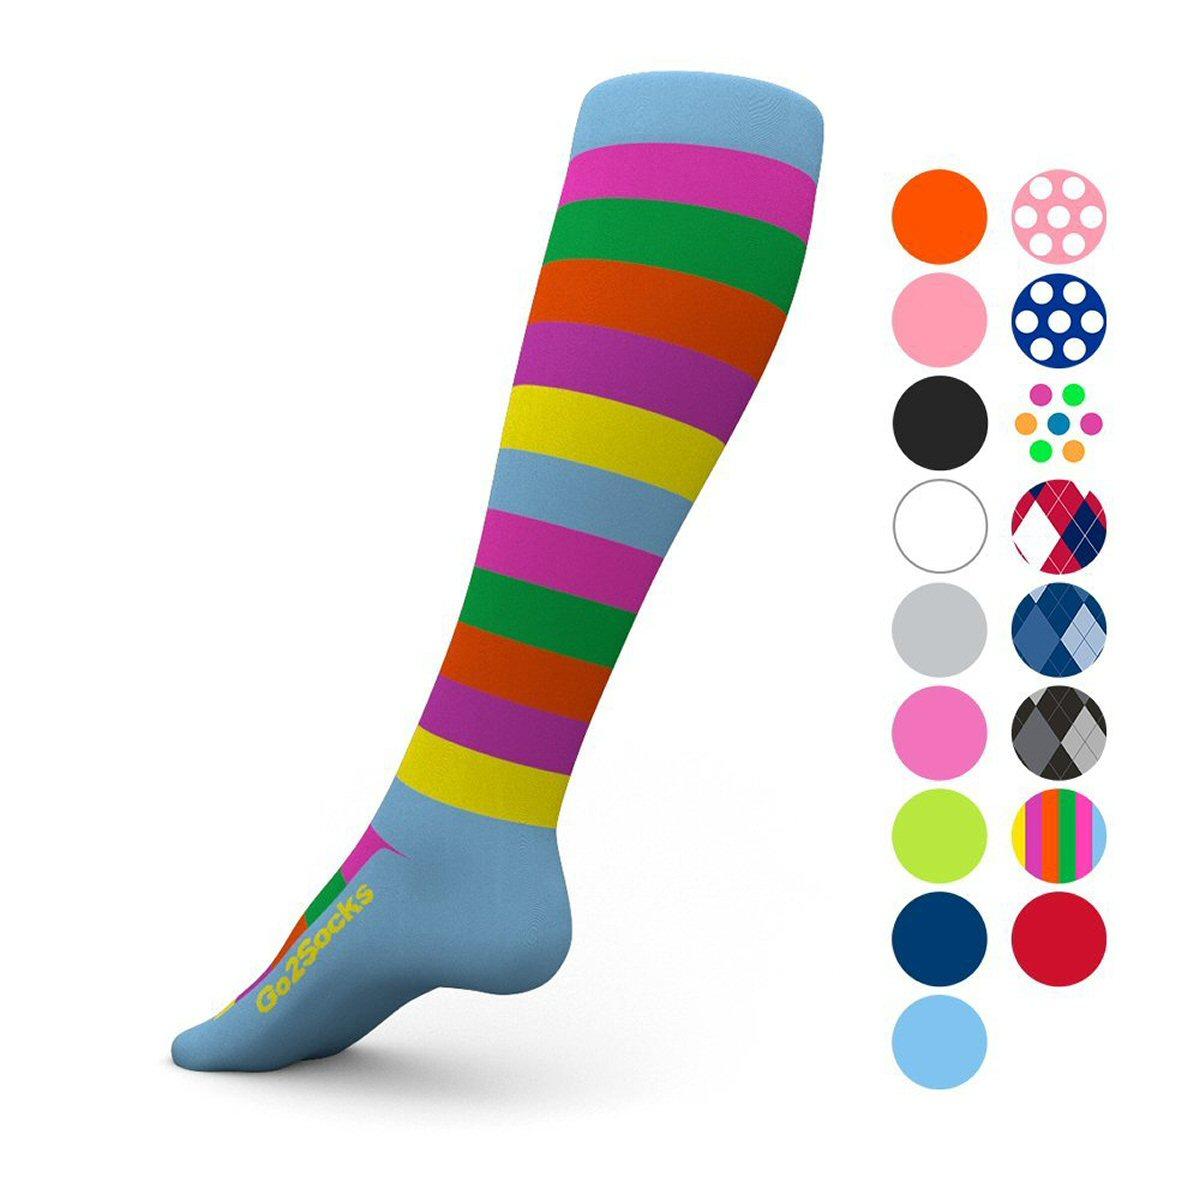 Improving Your Circulation - Compression Socks